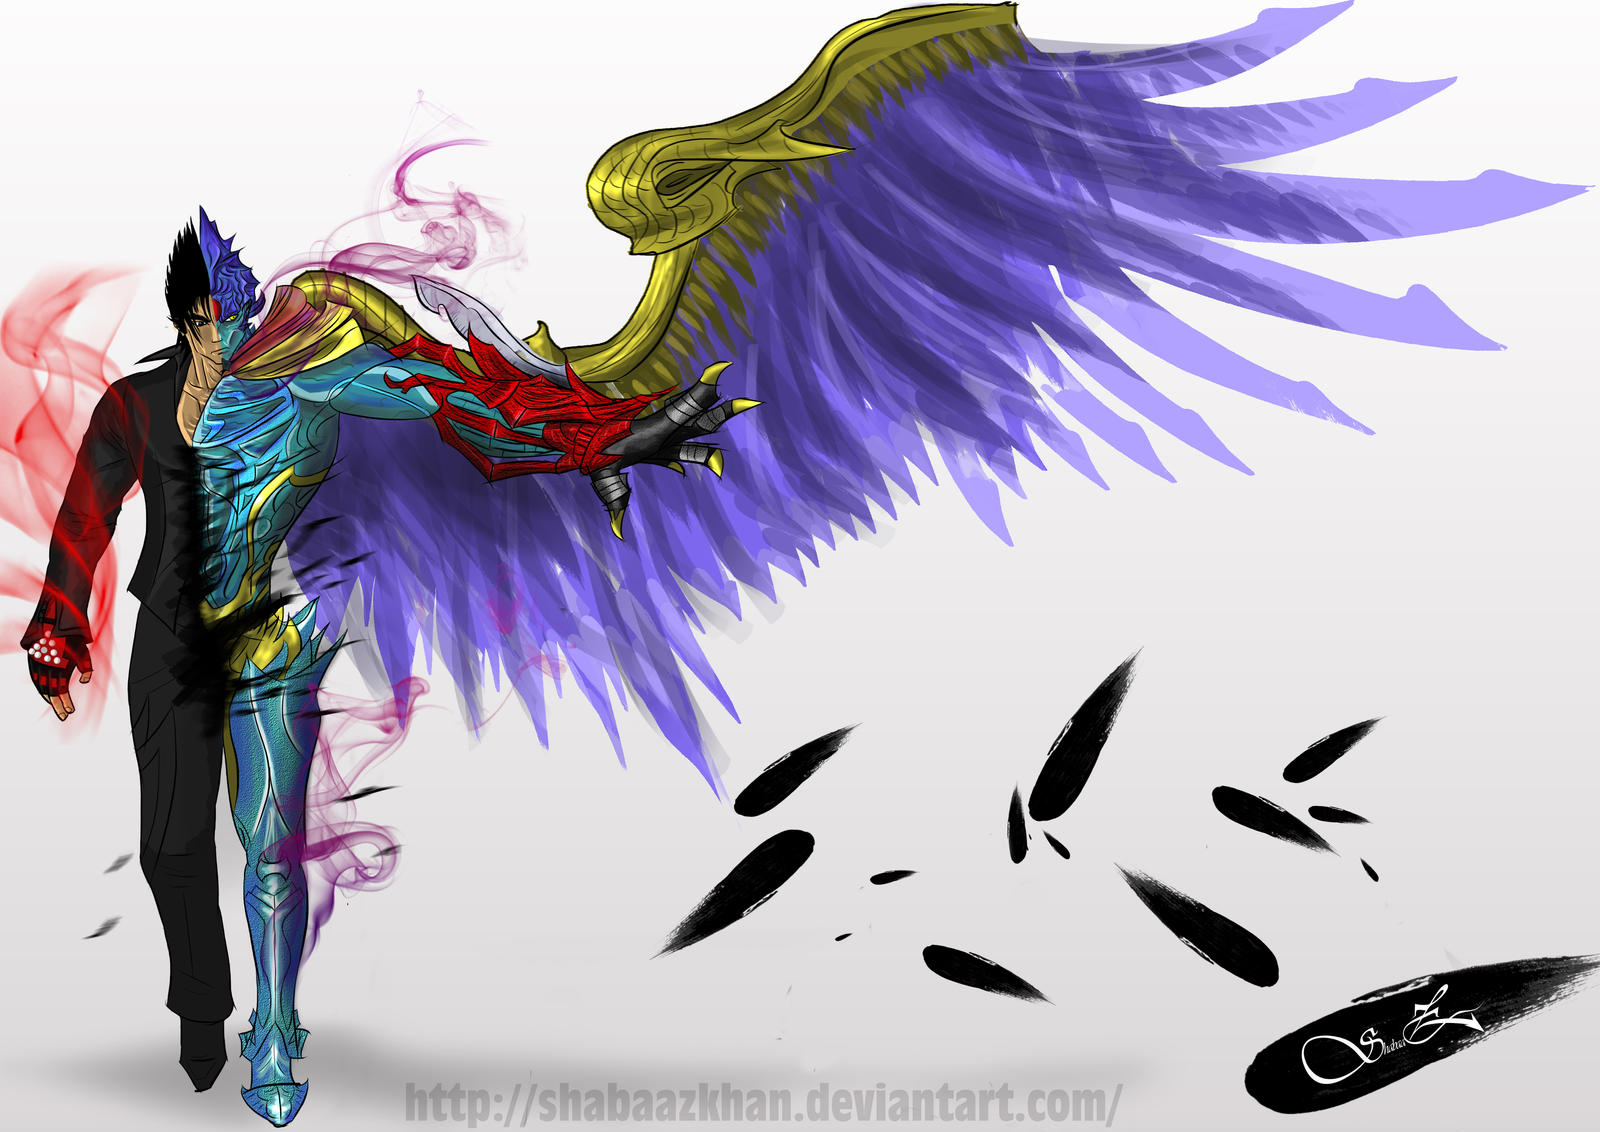 Jin Blood Vengeance Devil Hybrid Transformation By Shabaazkhan On